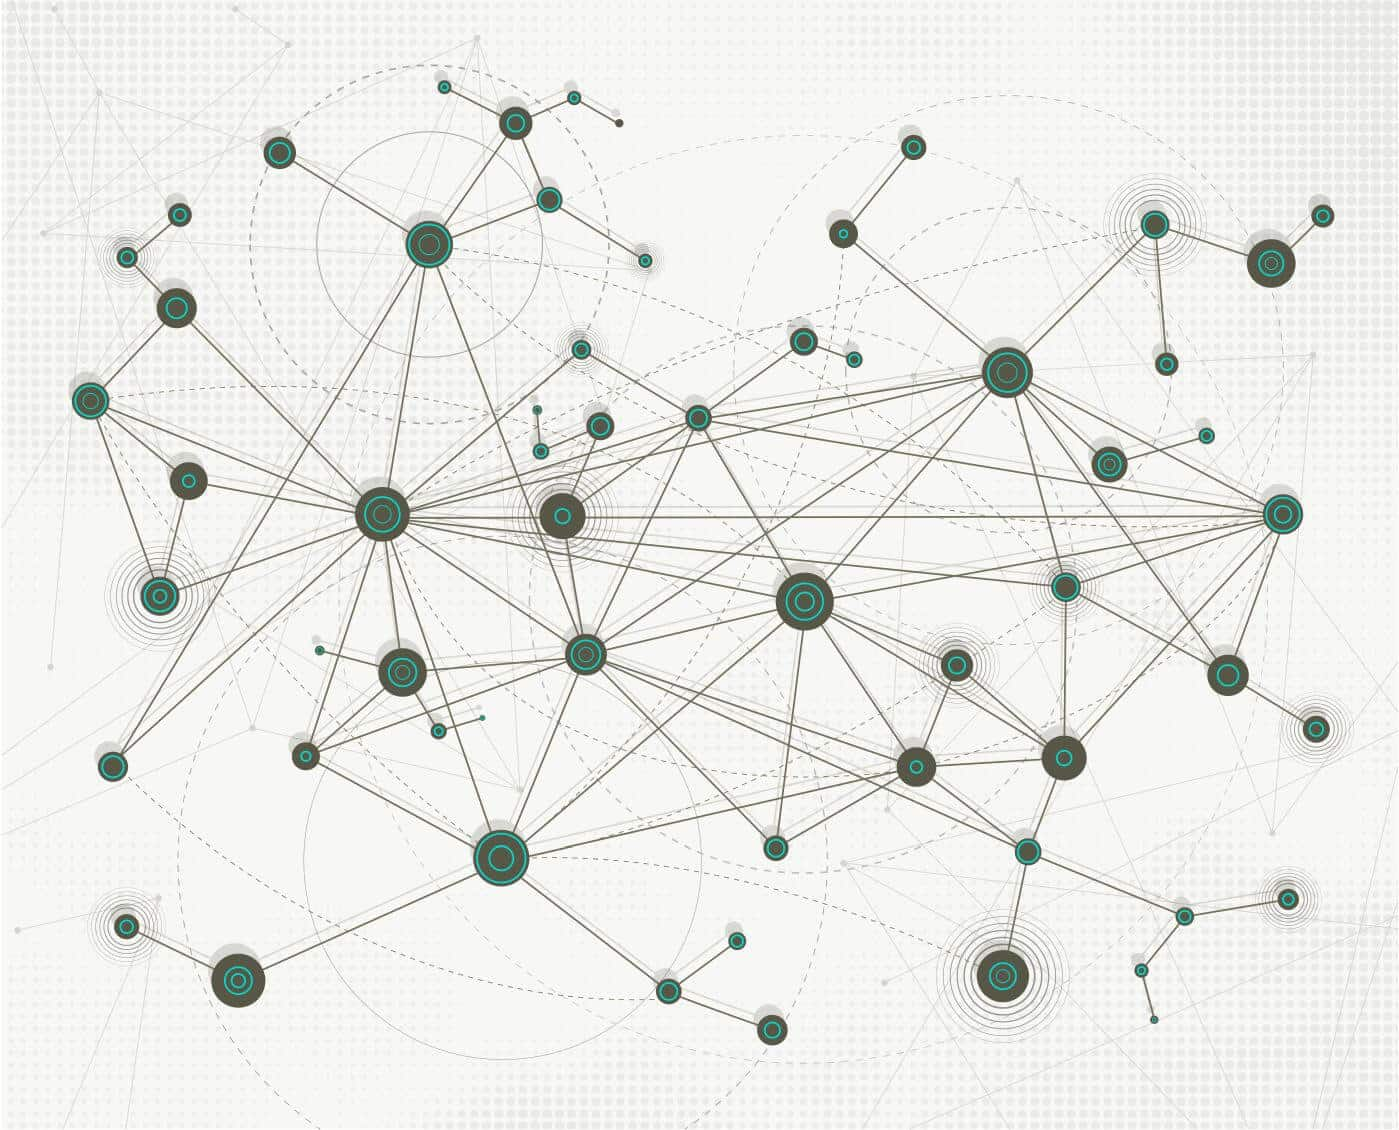 Network Migration: Essential Principles for Decision